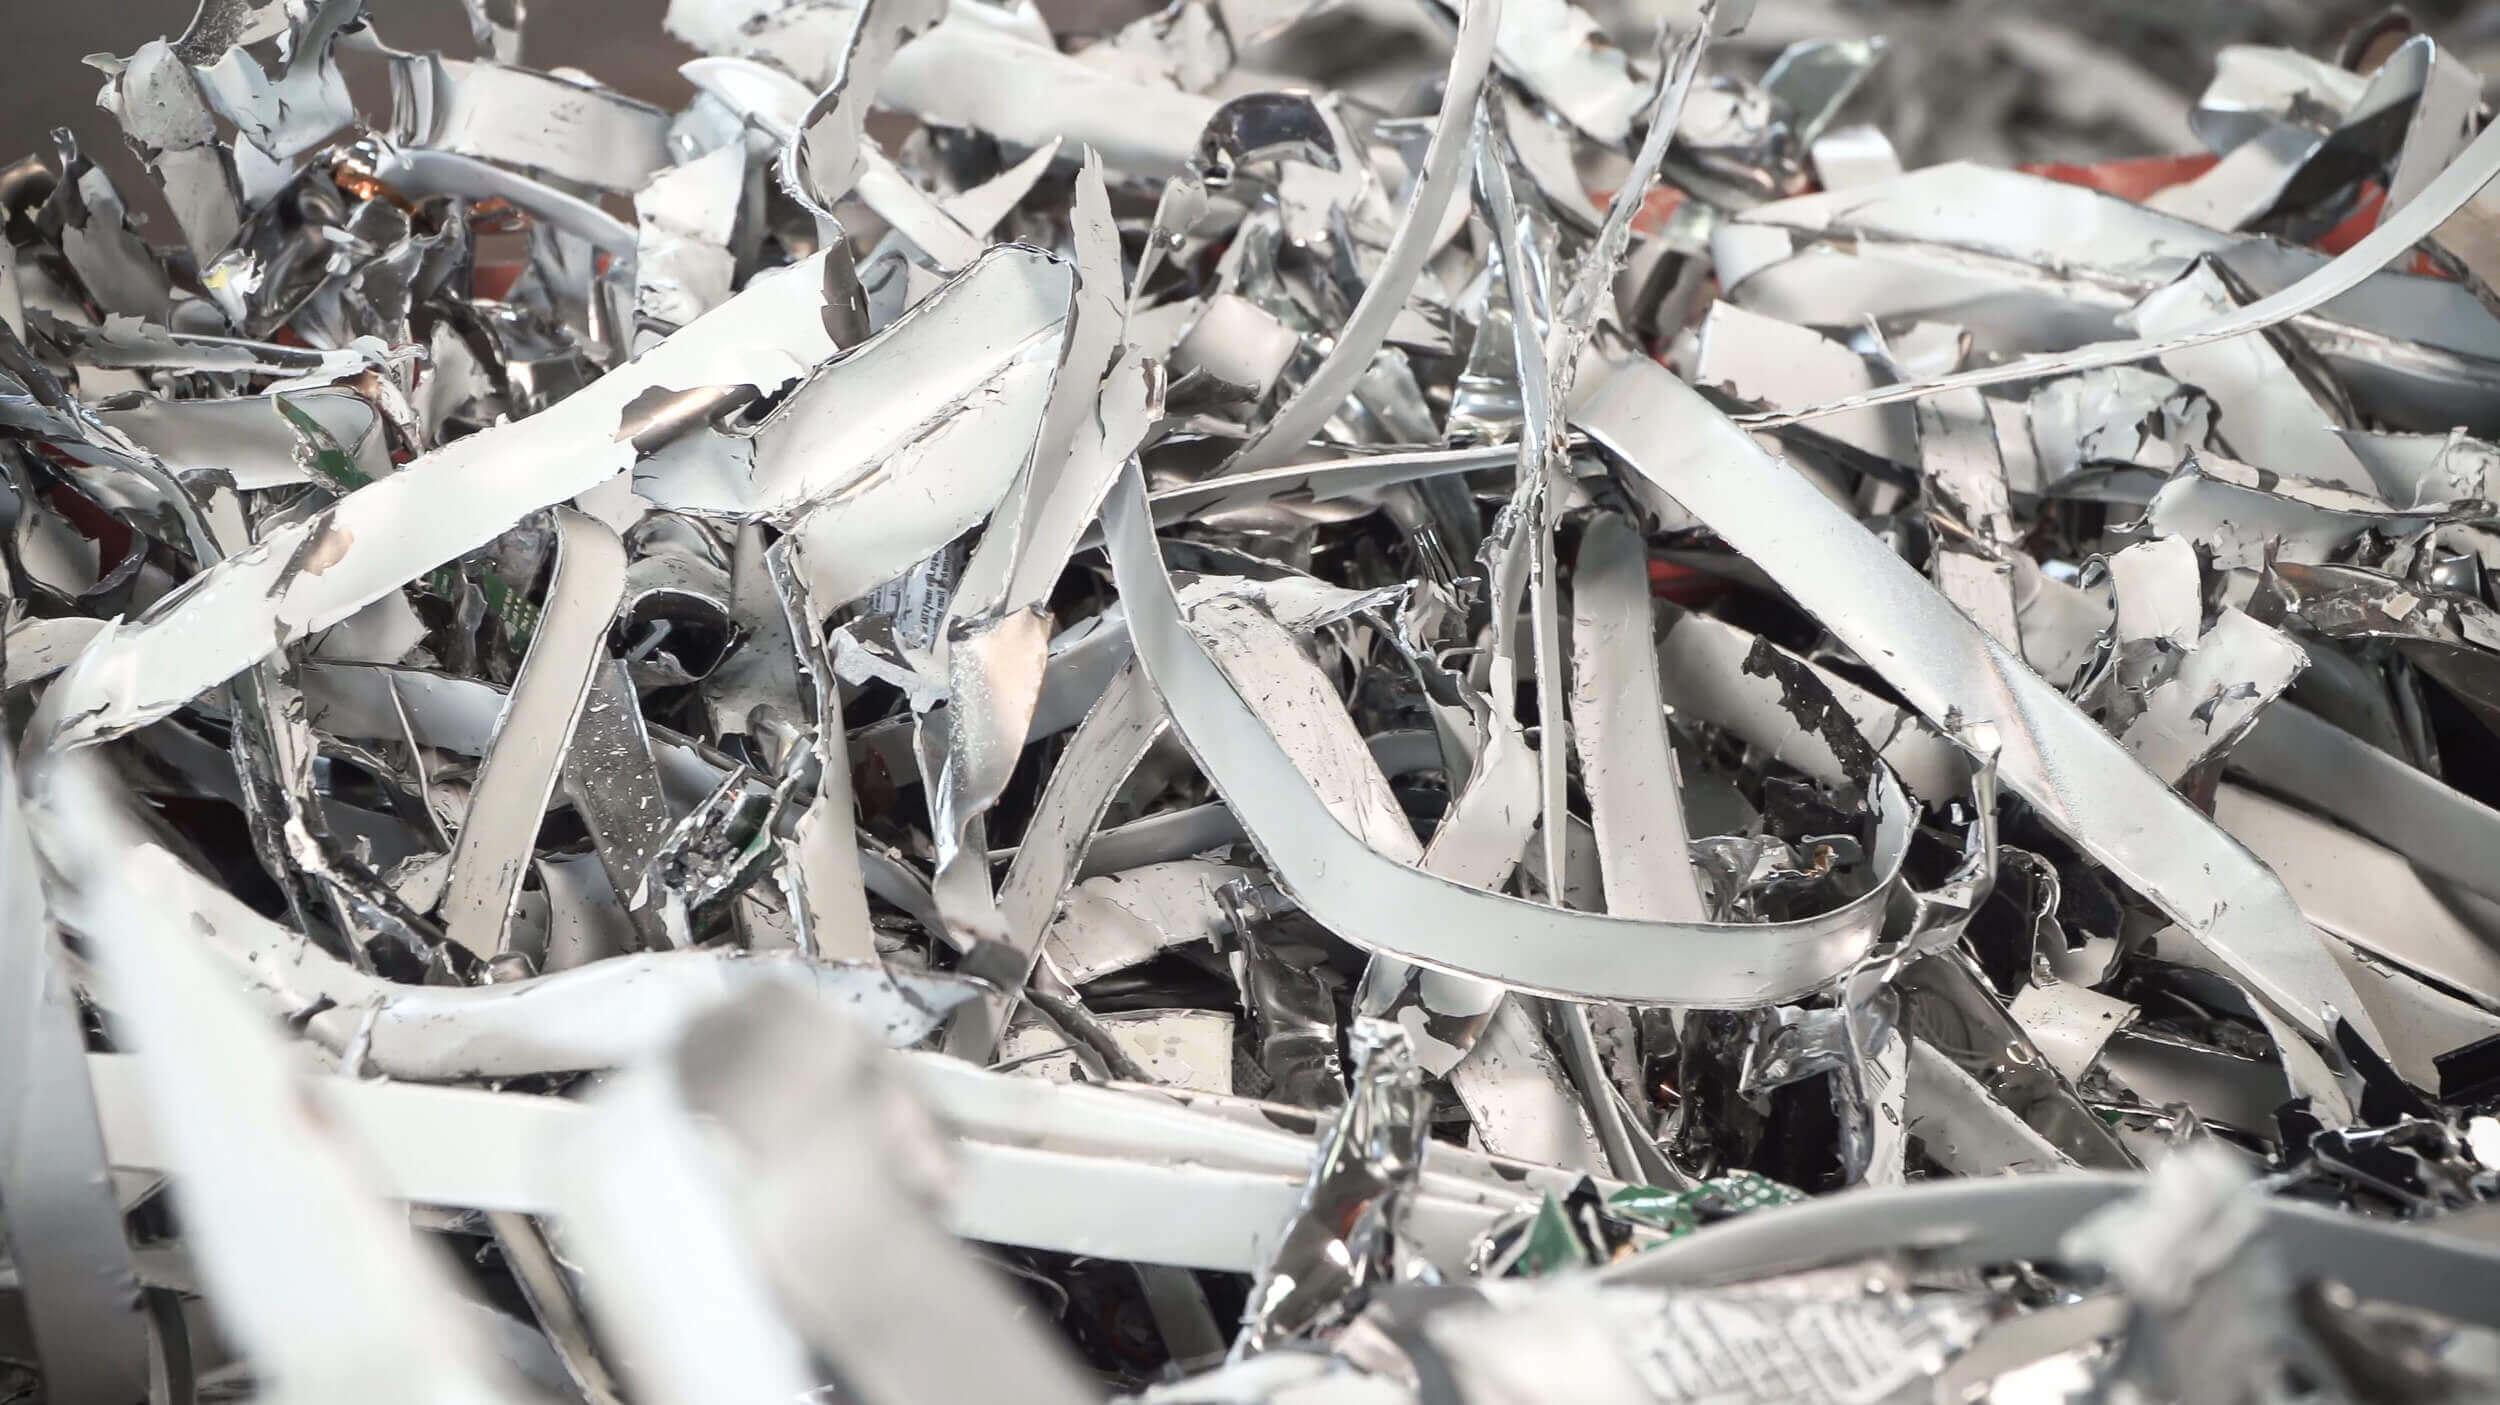 Electronic scrap metal housing sheet metal e-scrap